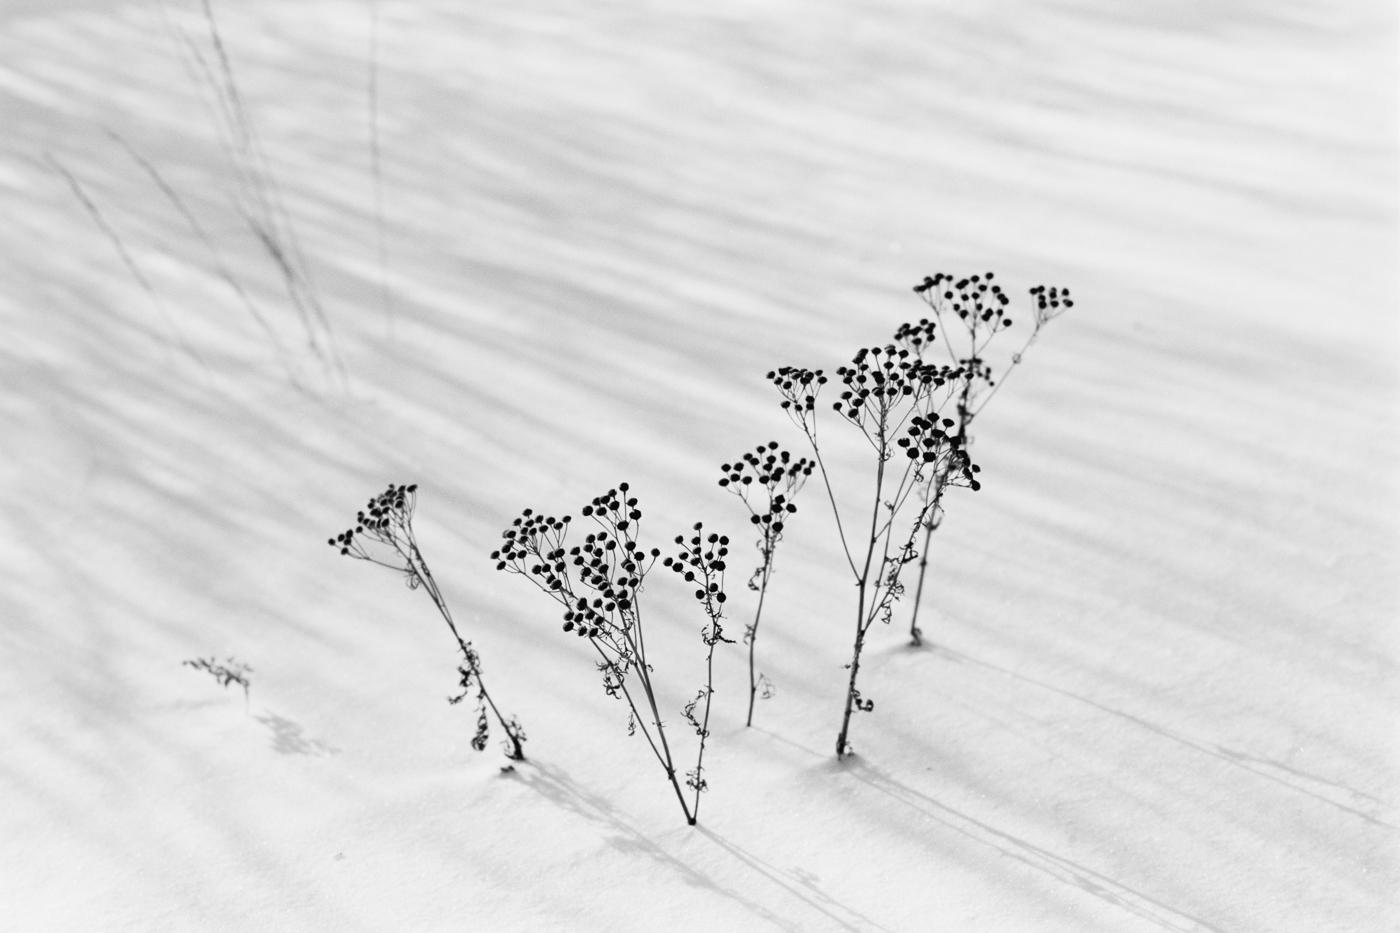 snow winter flowers